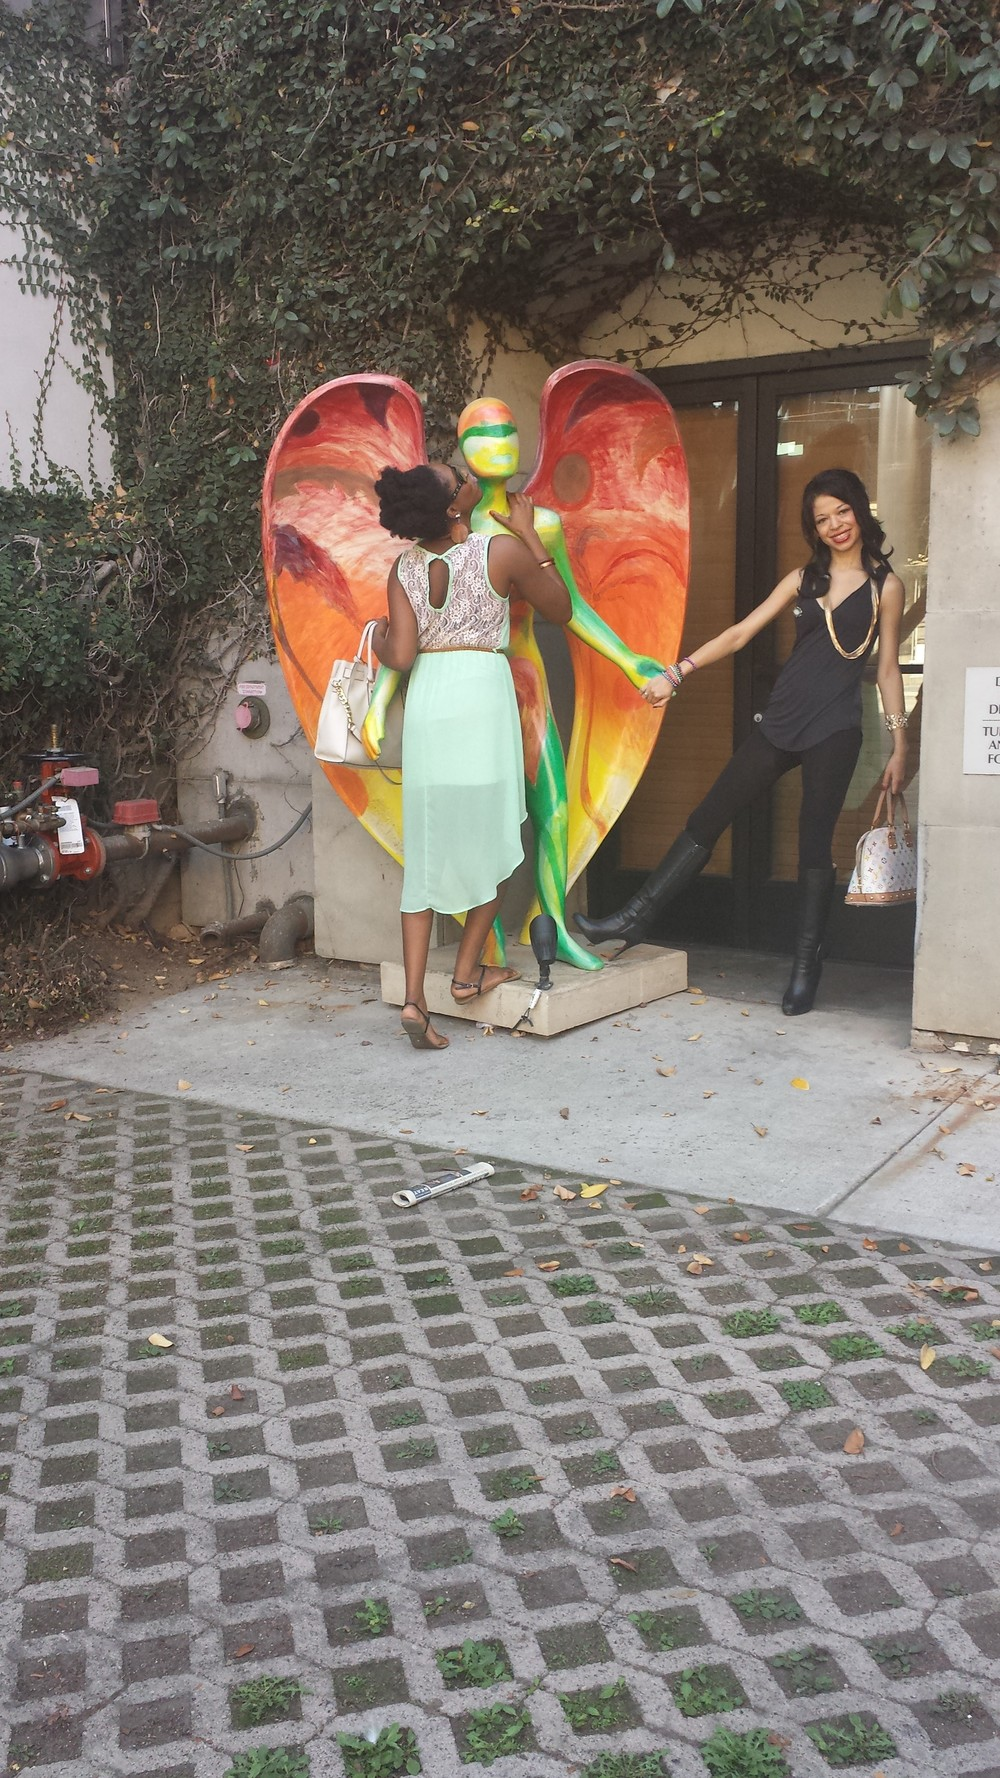 Kissing a rainbow statue :) It happens